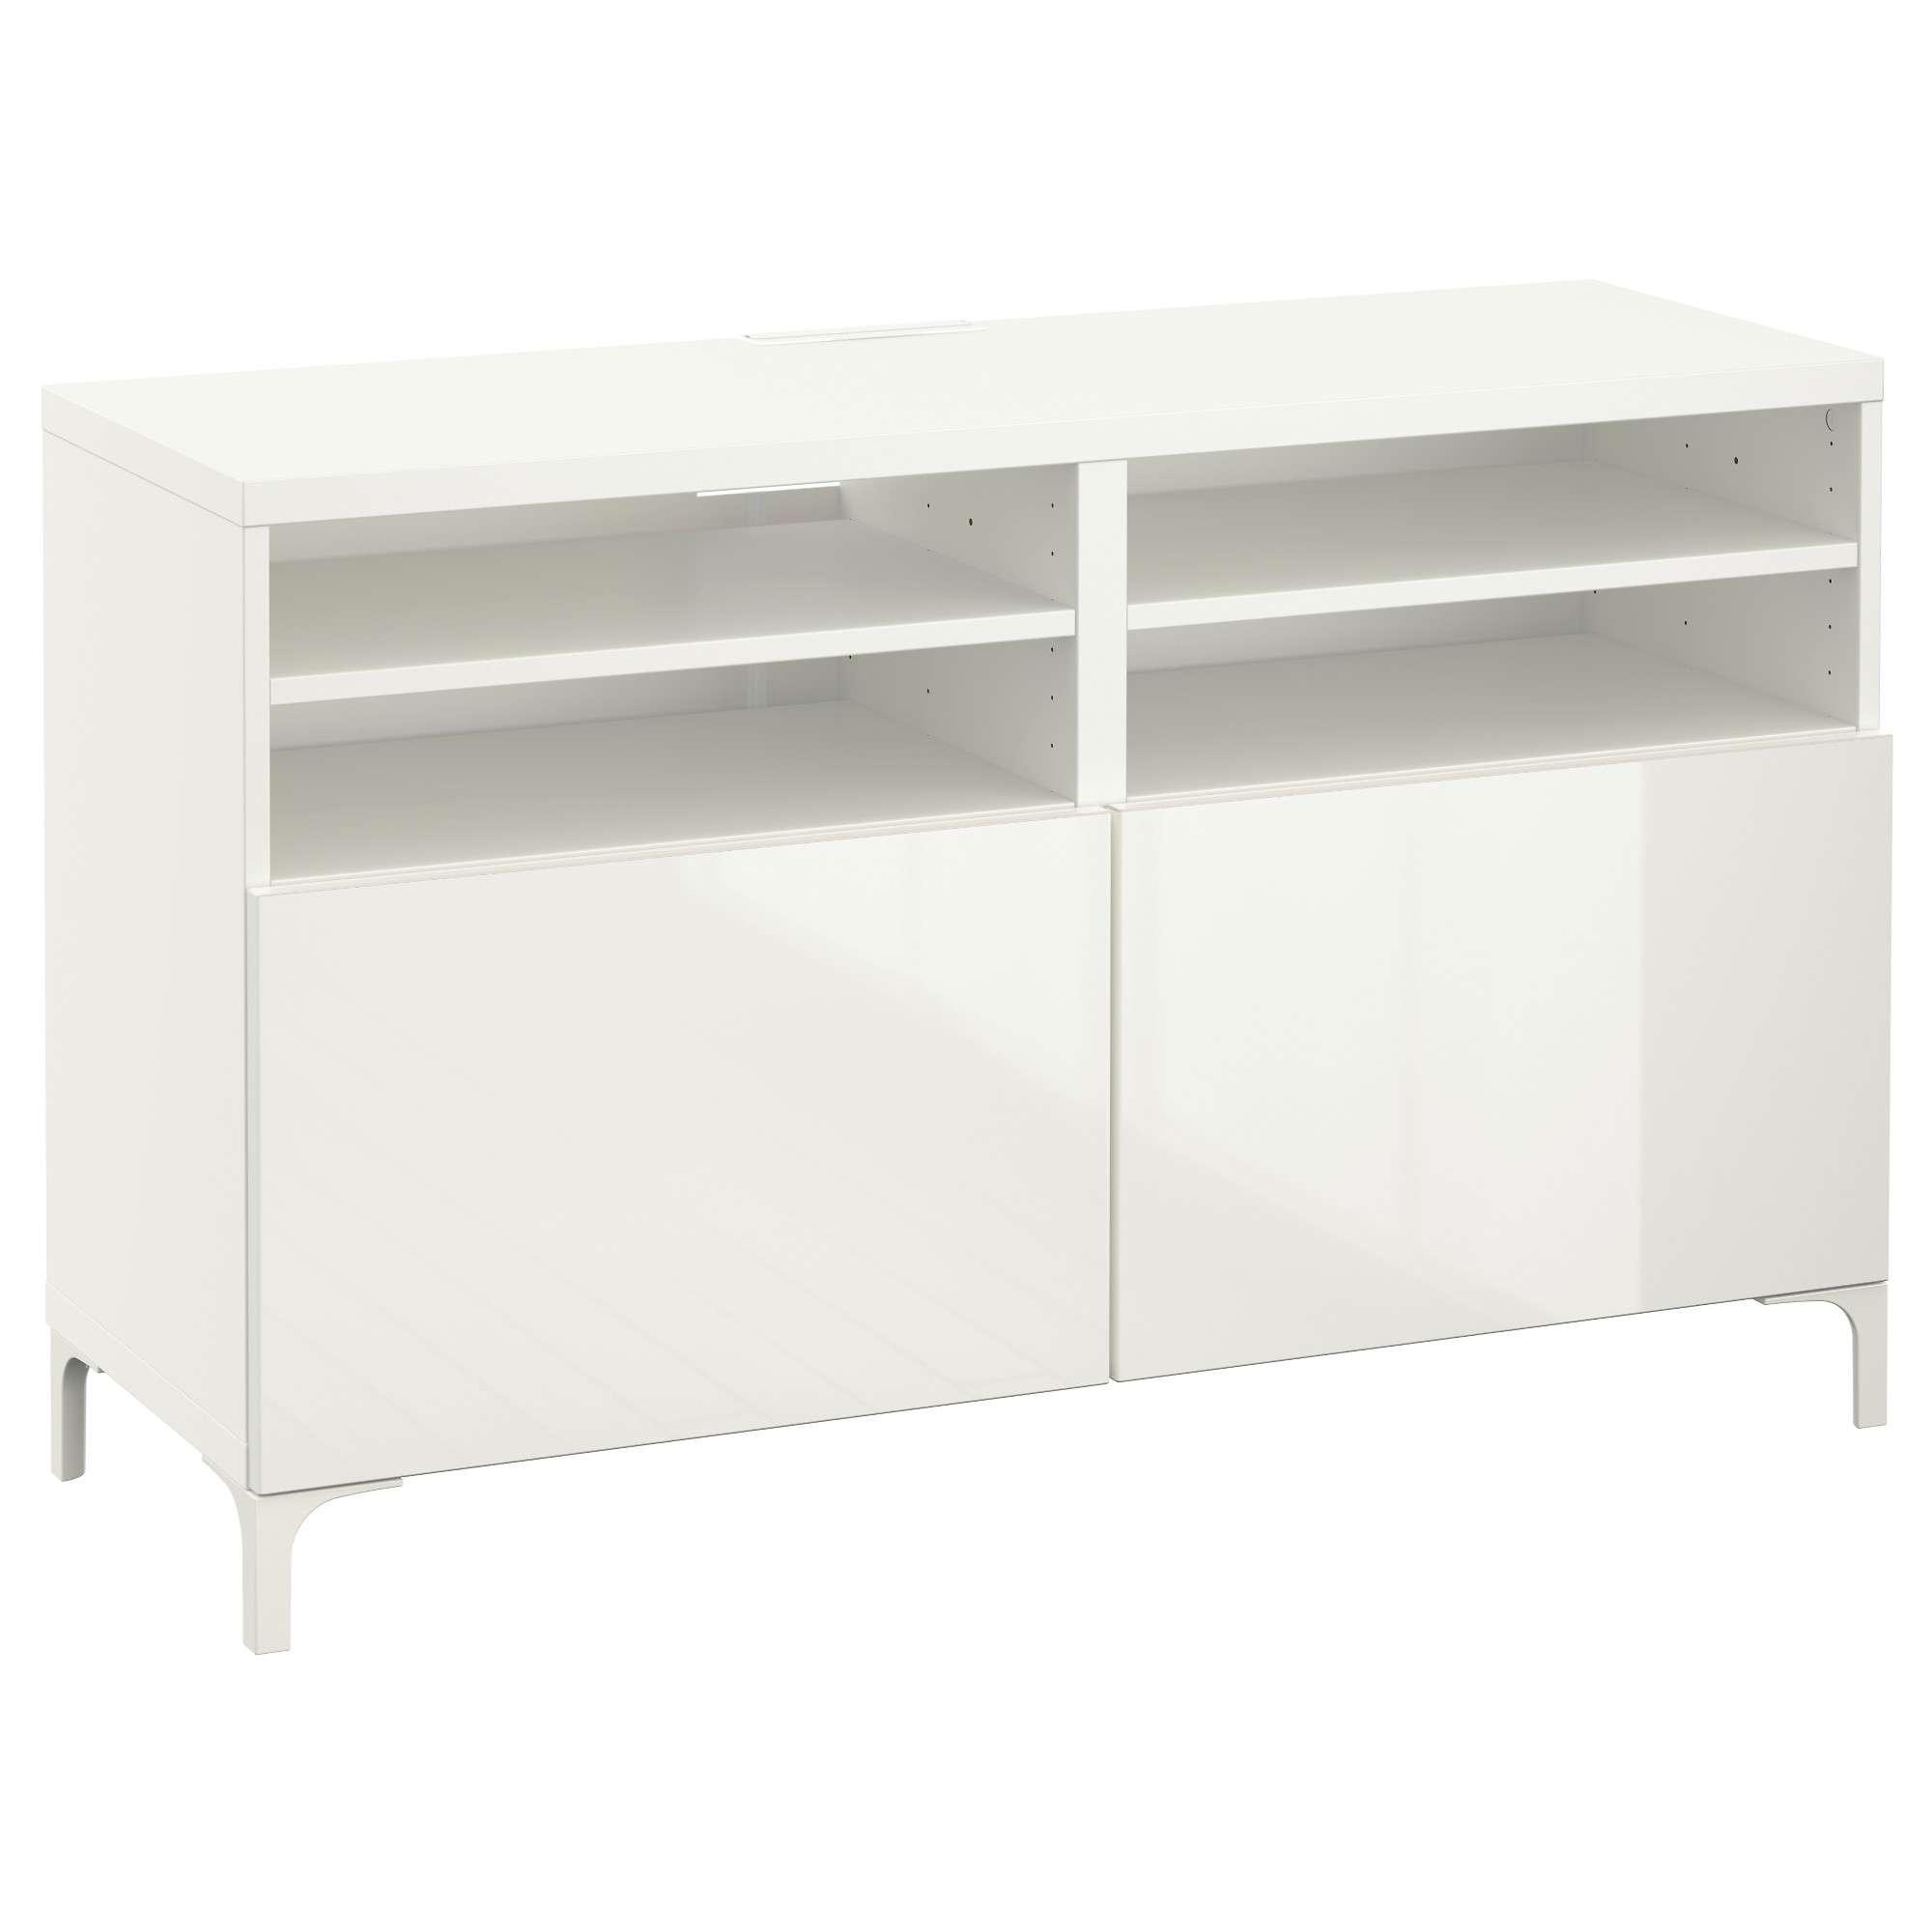 Bestå Tv Unit With Doors – White/selsviken High Gloss/white – Ikea With White Gloss Ikea Sideboards (View 7 of 20)